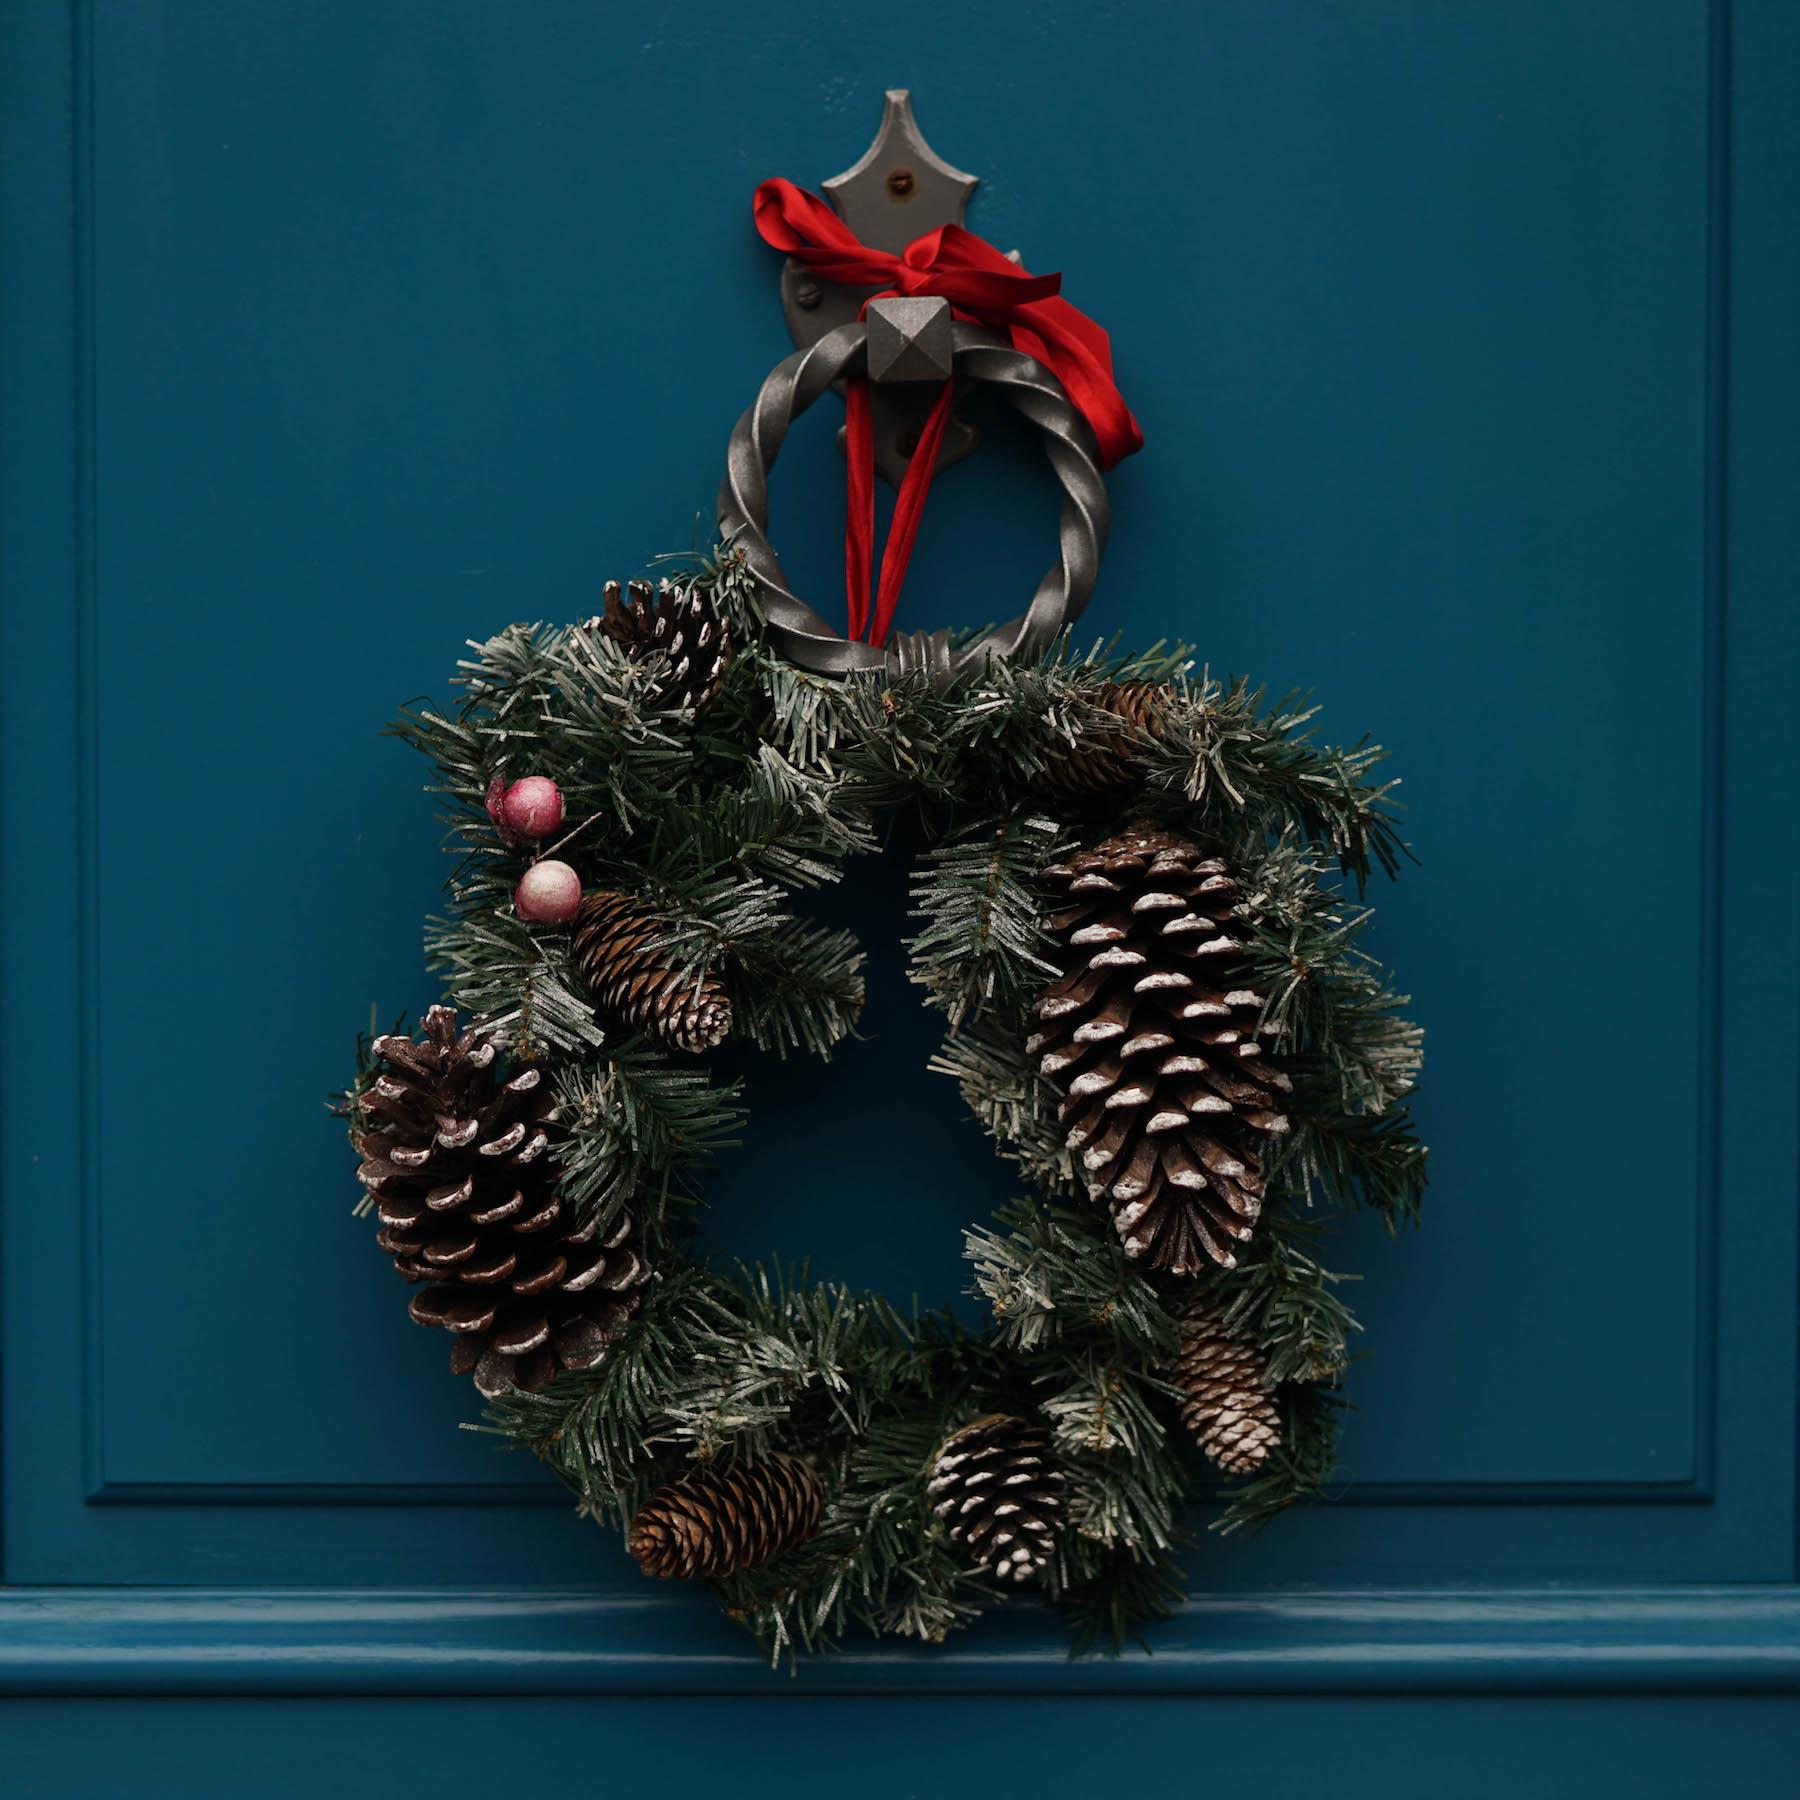 Netflix Weihnachtsfilme suelovesnyc_amazon_prime_netflix_weihnachtsfilme